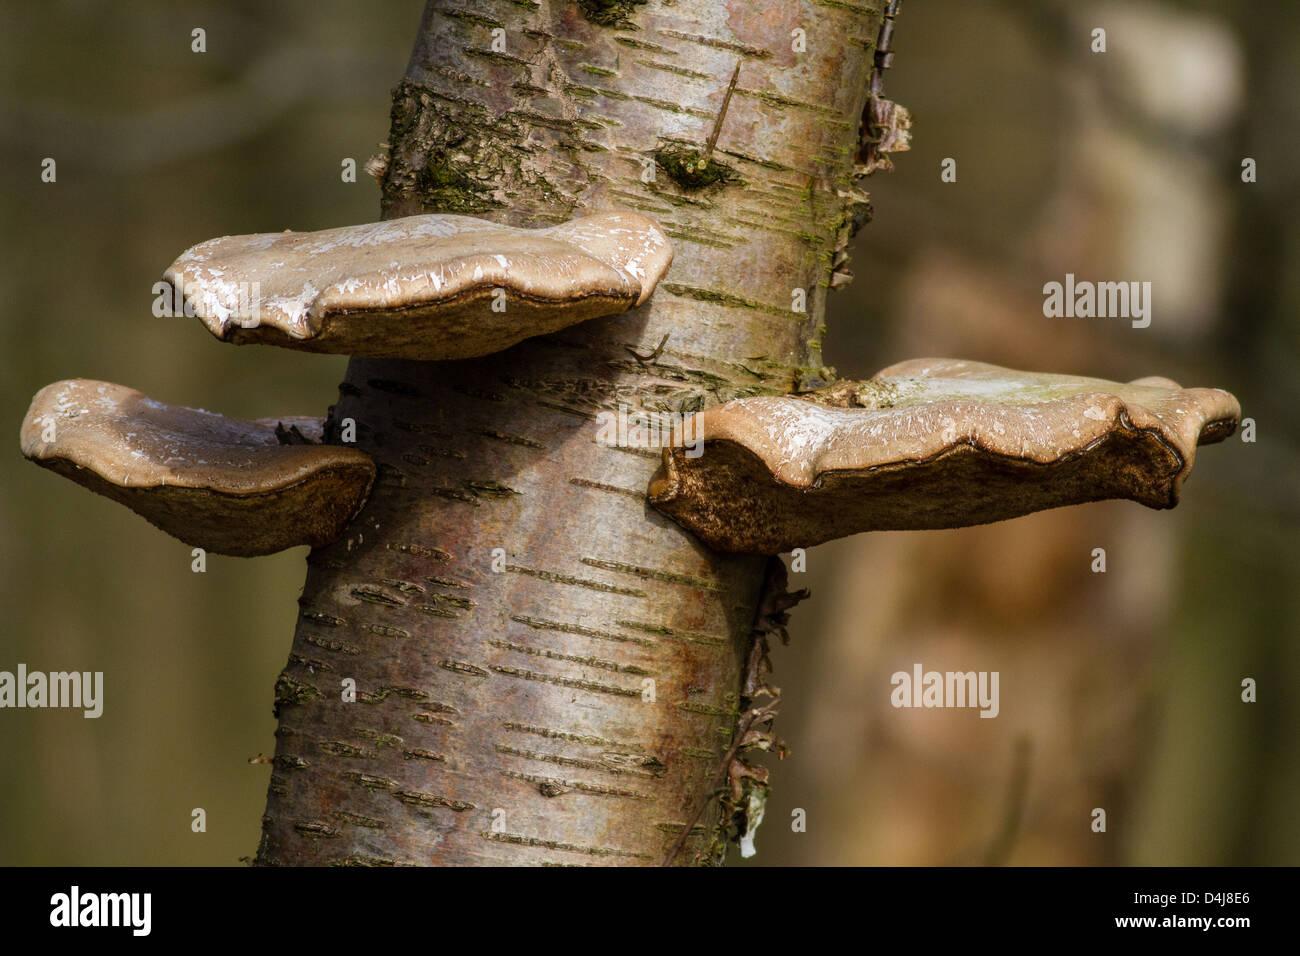 Tree fungus, Piptoporus betulinus, in soft sunlight, Yorkshire, UK - Stock Image